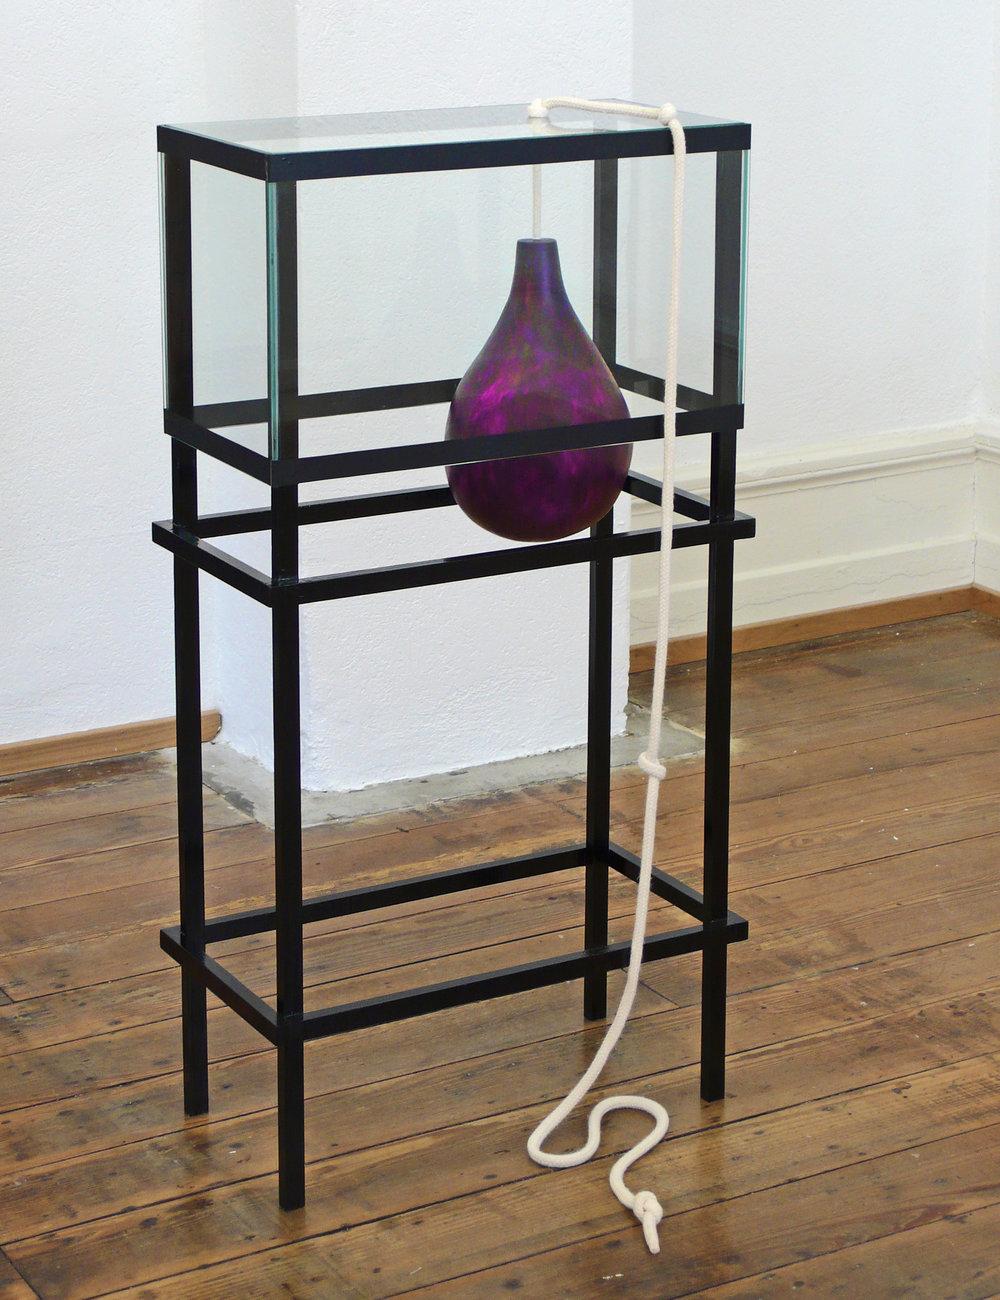 Geschehen erzeugen, wo Nichts Geschehen will, 2010 Glas, Gips, Holz, Lackfarbe, Seil, Klebeband 100 x 50 x 25 cm